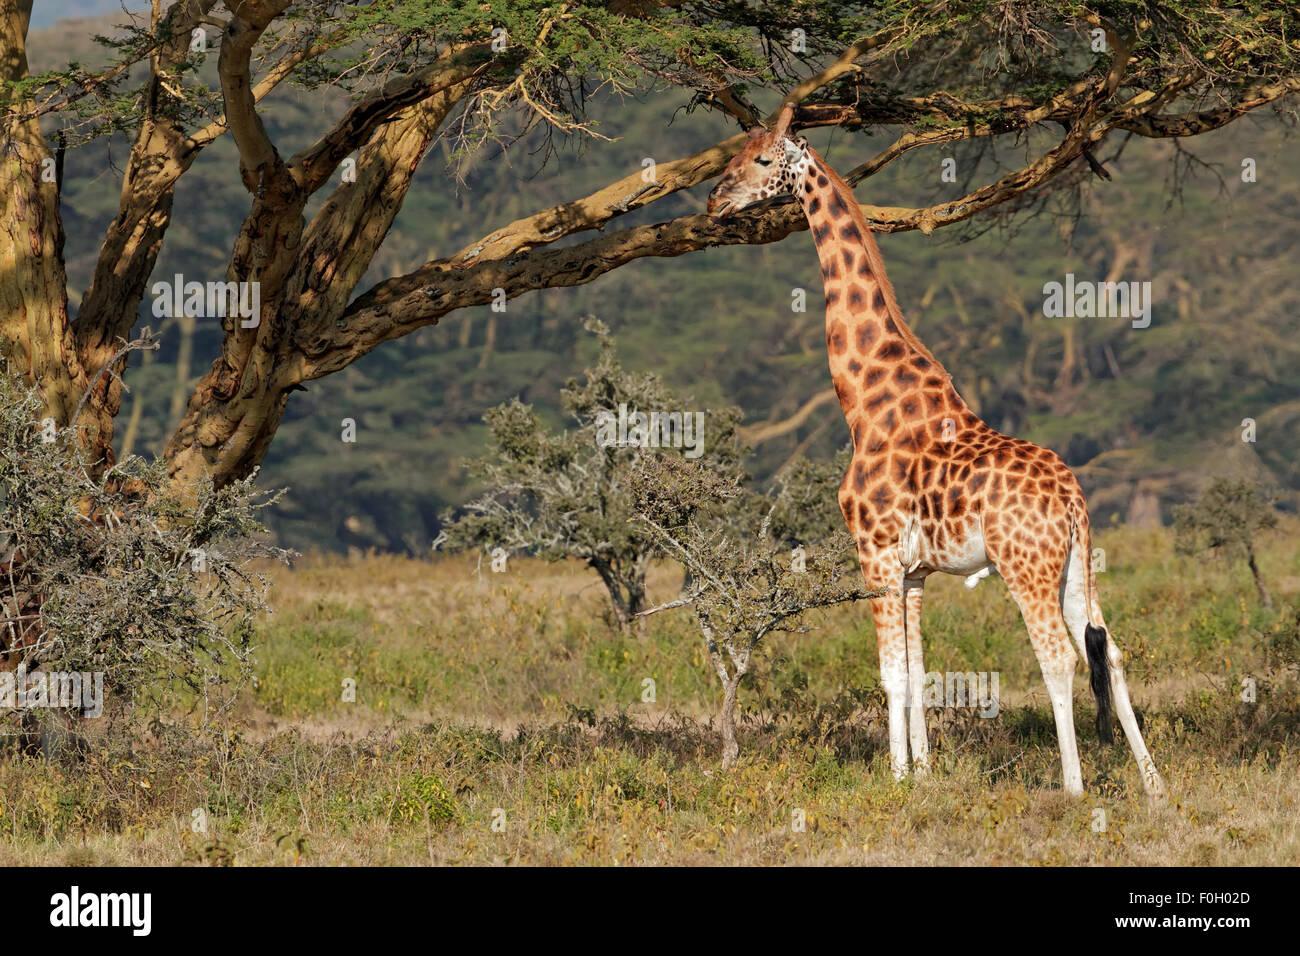 Rare Rothschilds giraffe (Giraffa camelopardalis rothschildi), Lake Nakuru National Park, Kenya - Stock Image